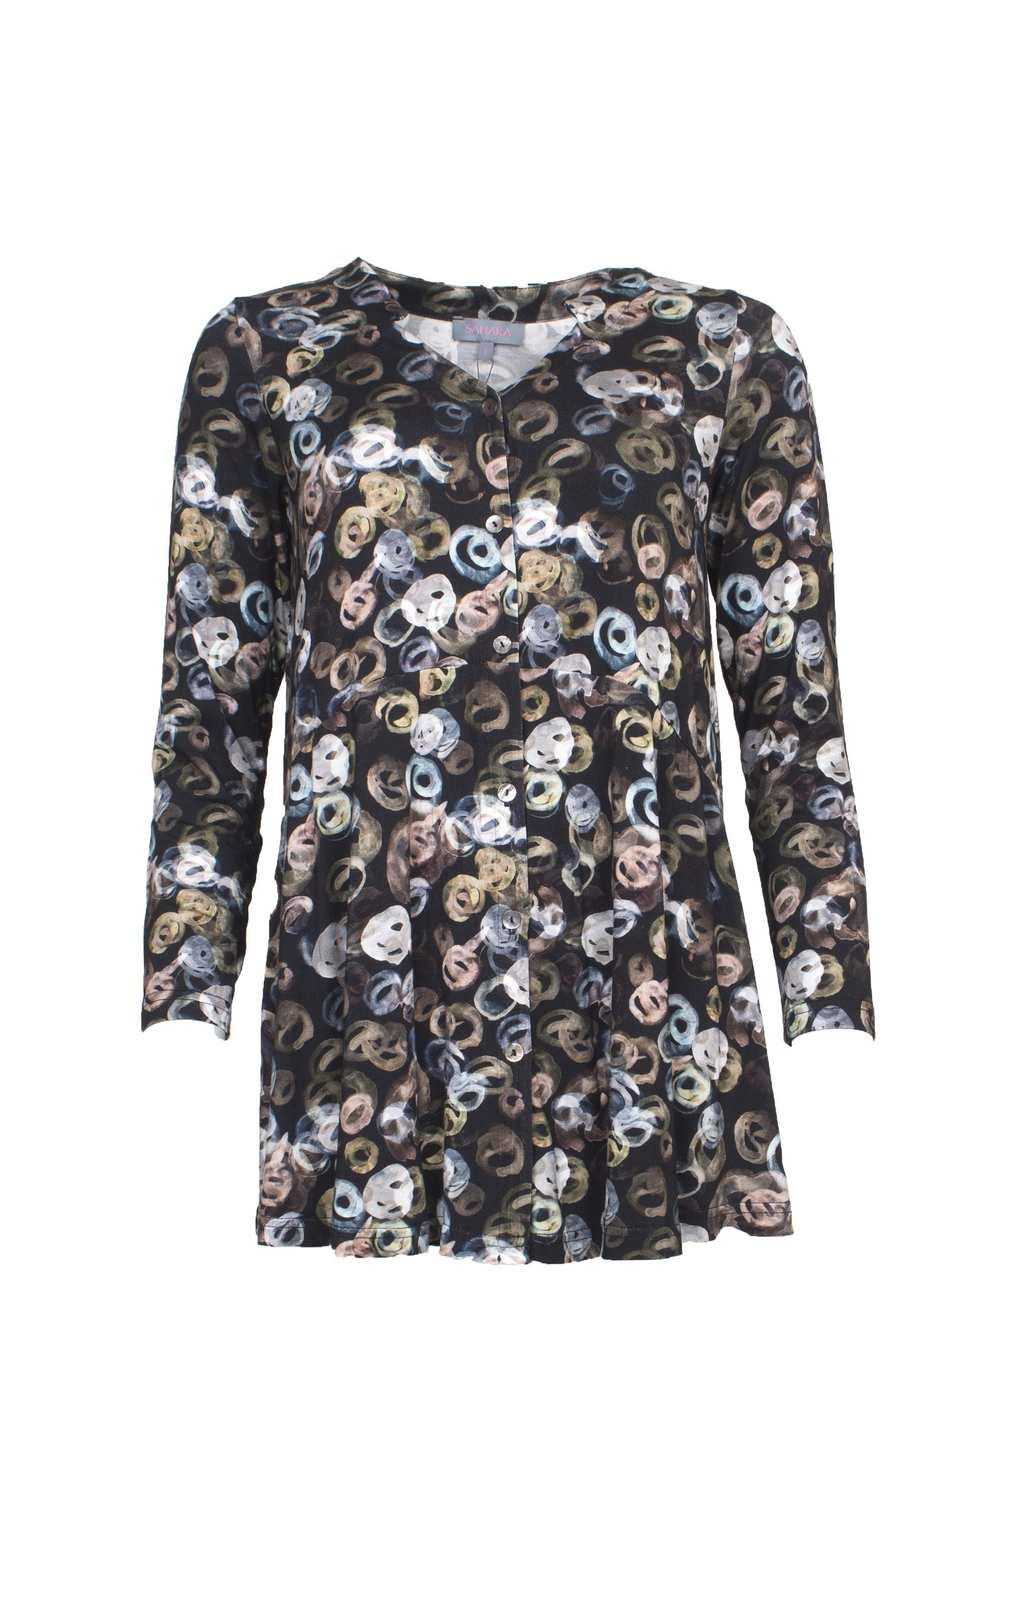 488c9ee80d2 Scribble Spot Swing Shirt Green - Katie Kerr - Women s Clothing - UK